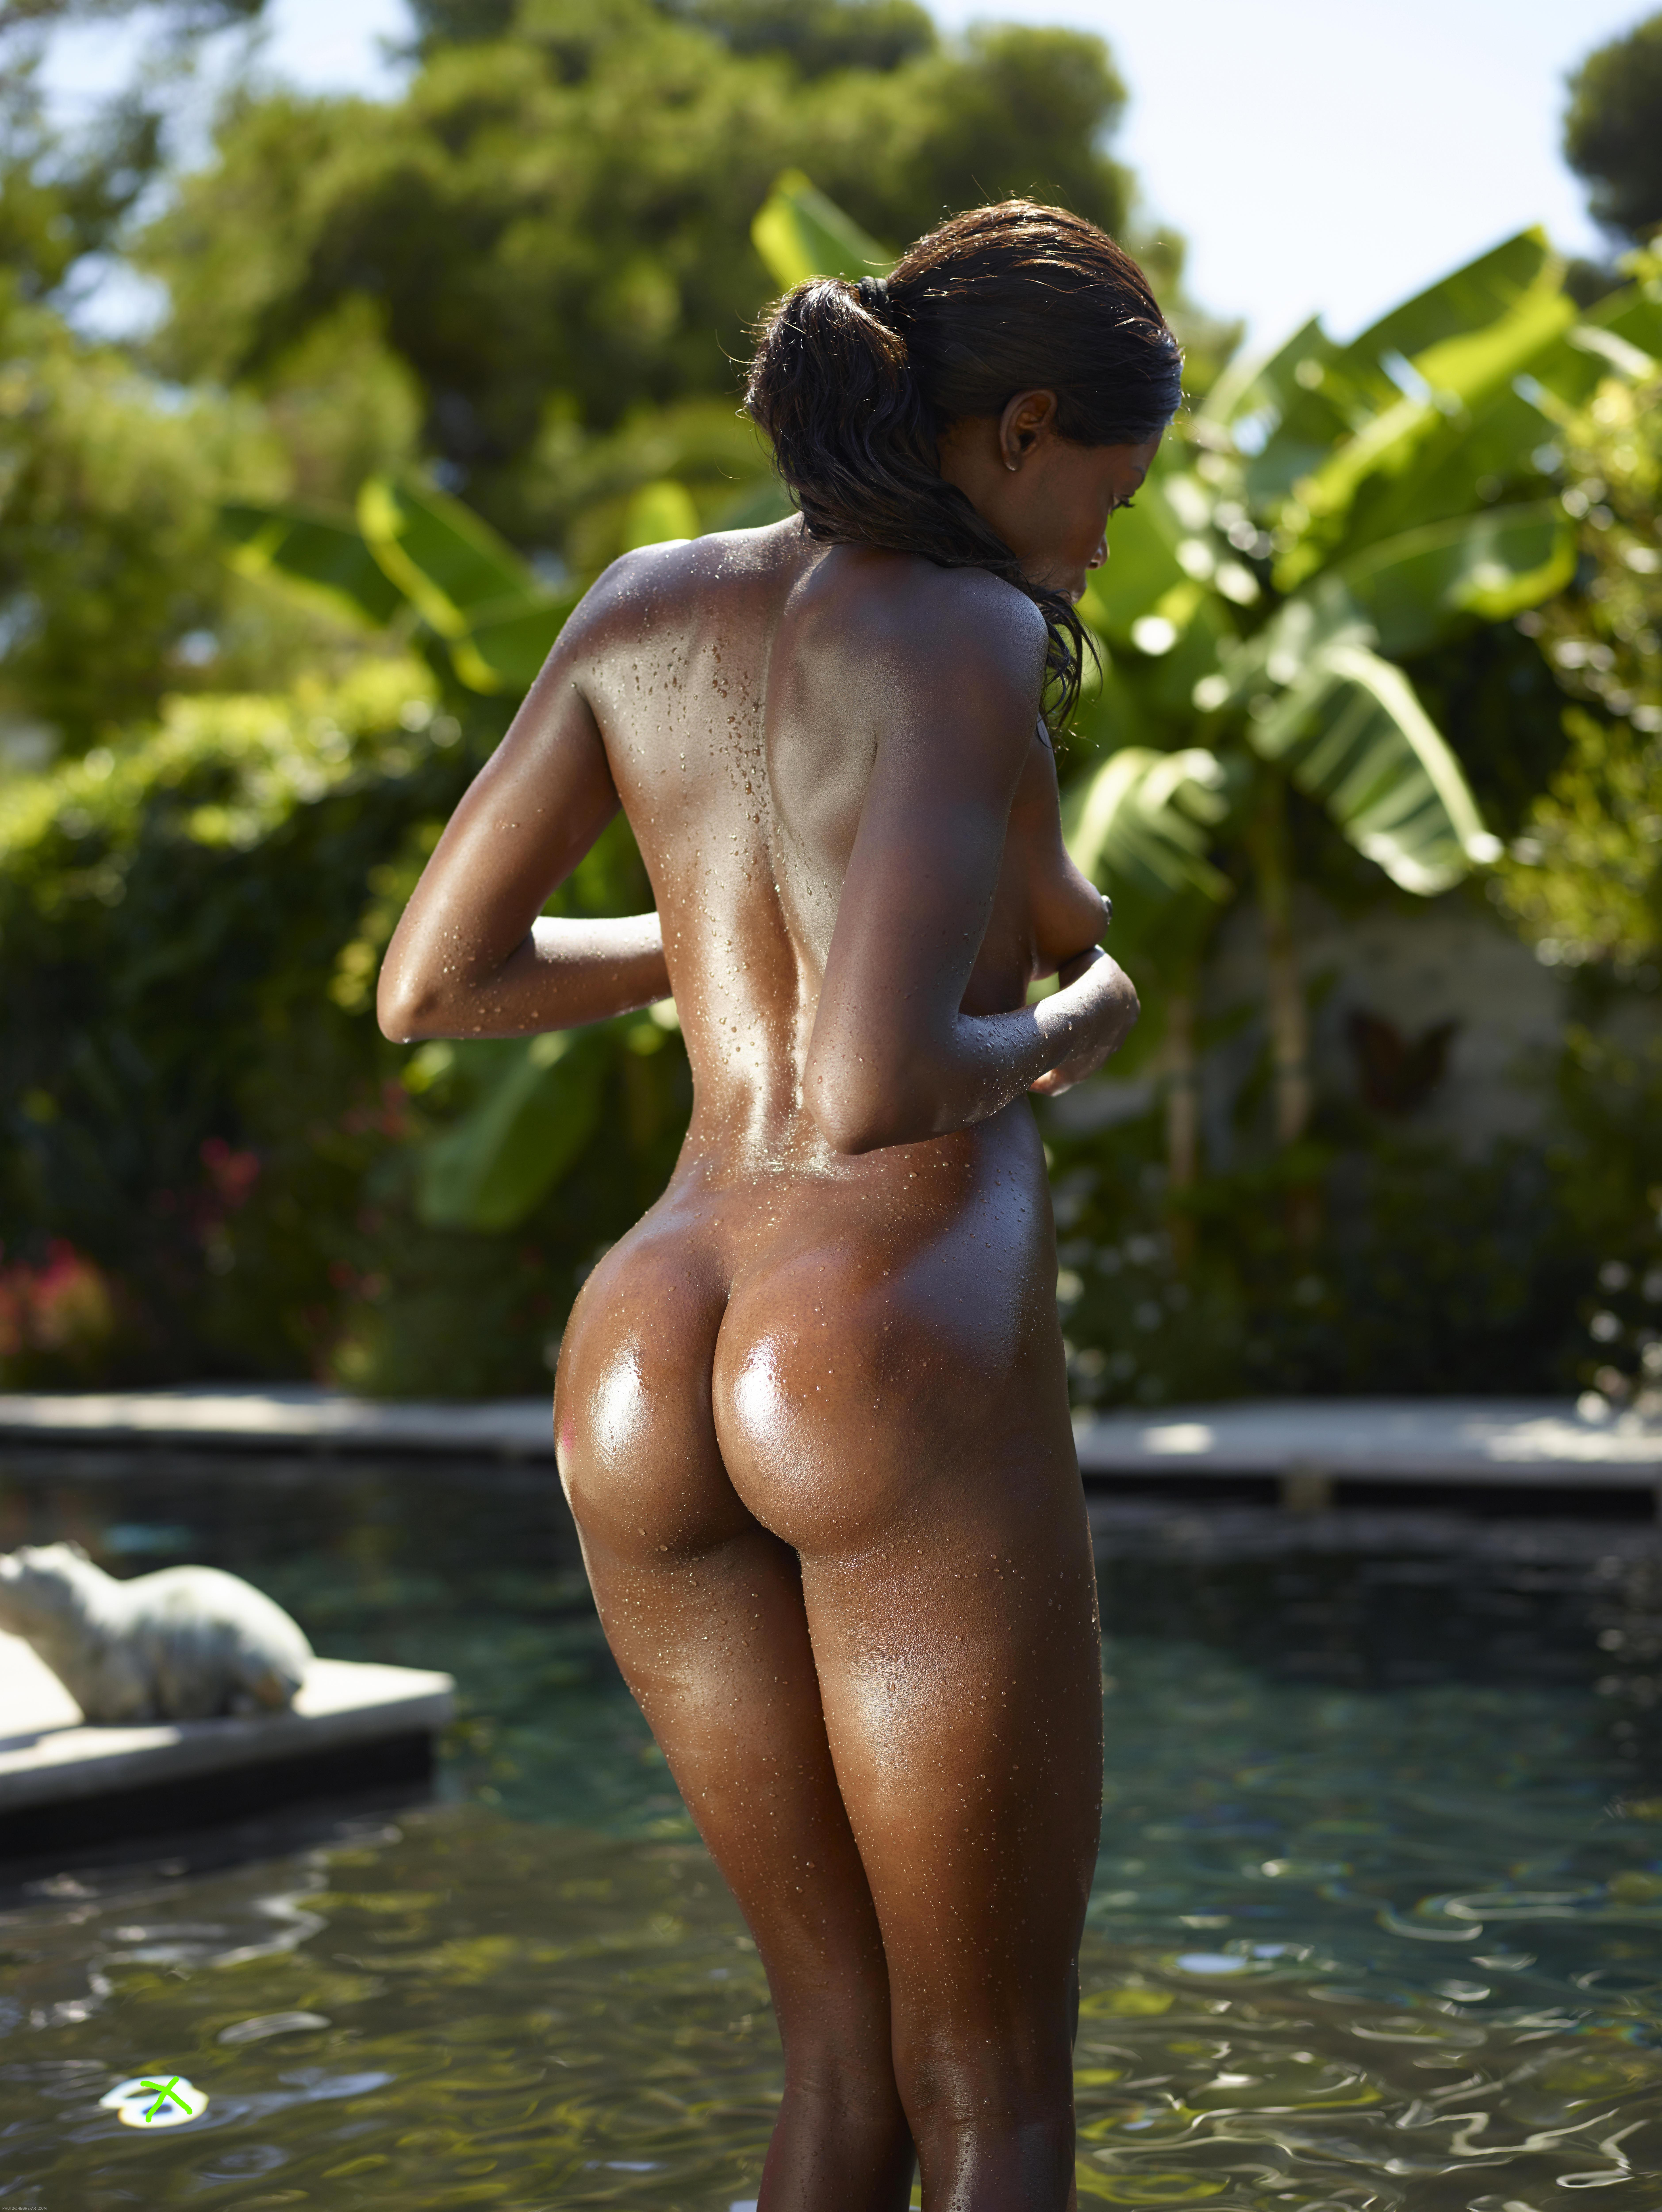 Black girl in pool naked, tahiti babes